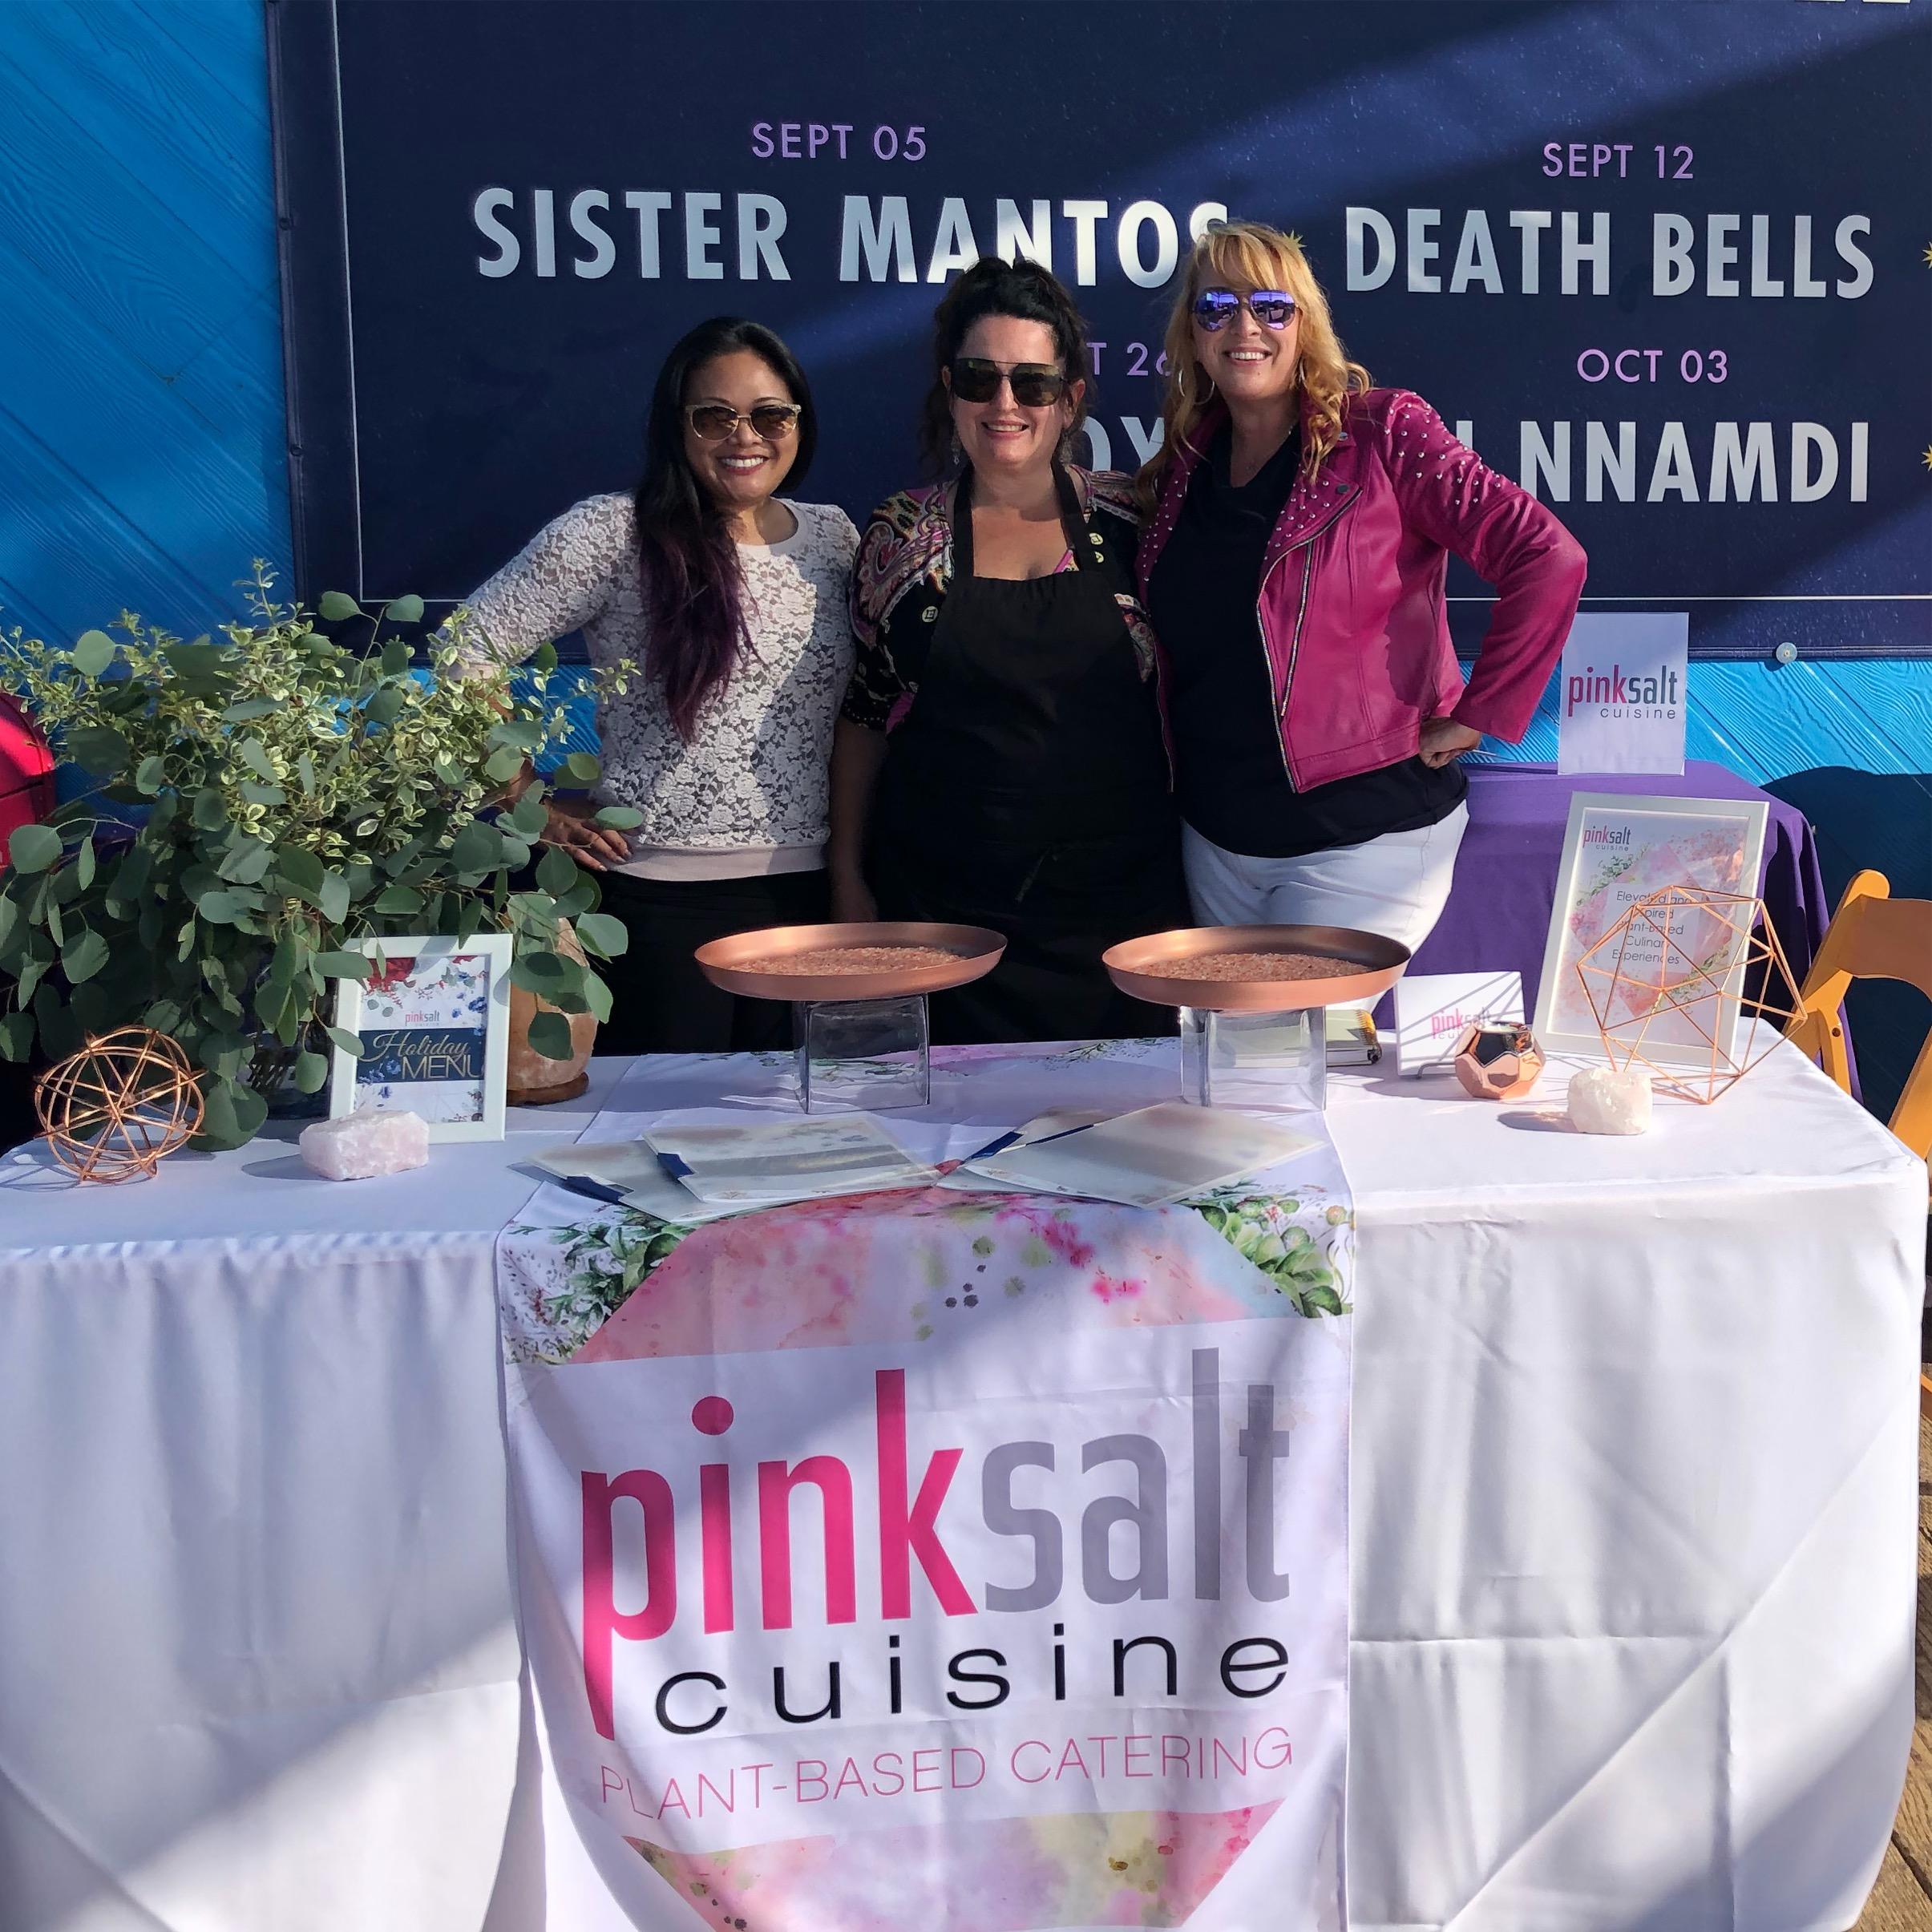 The Pink Salt Cuisine Team